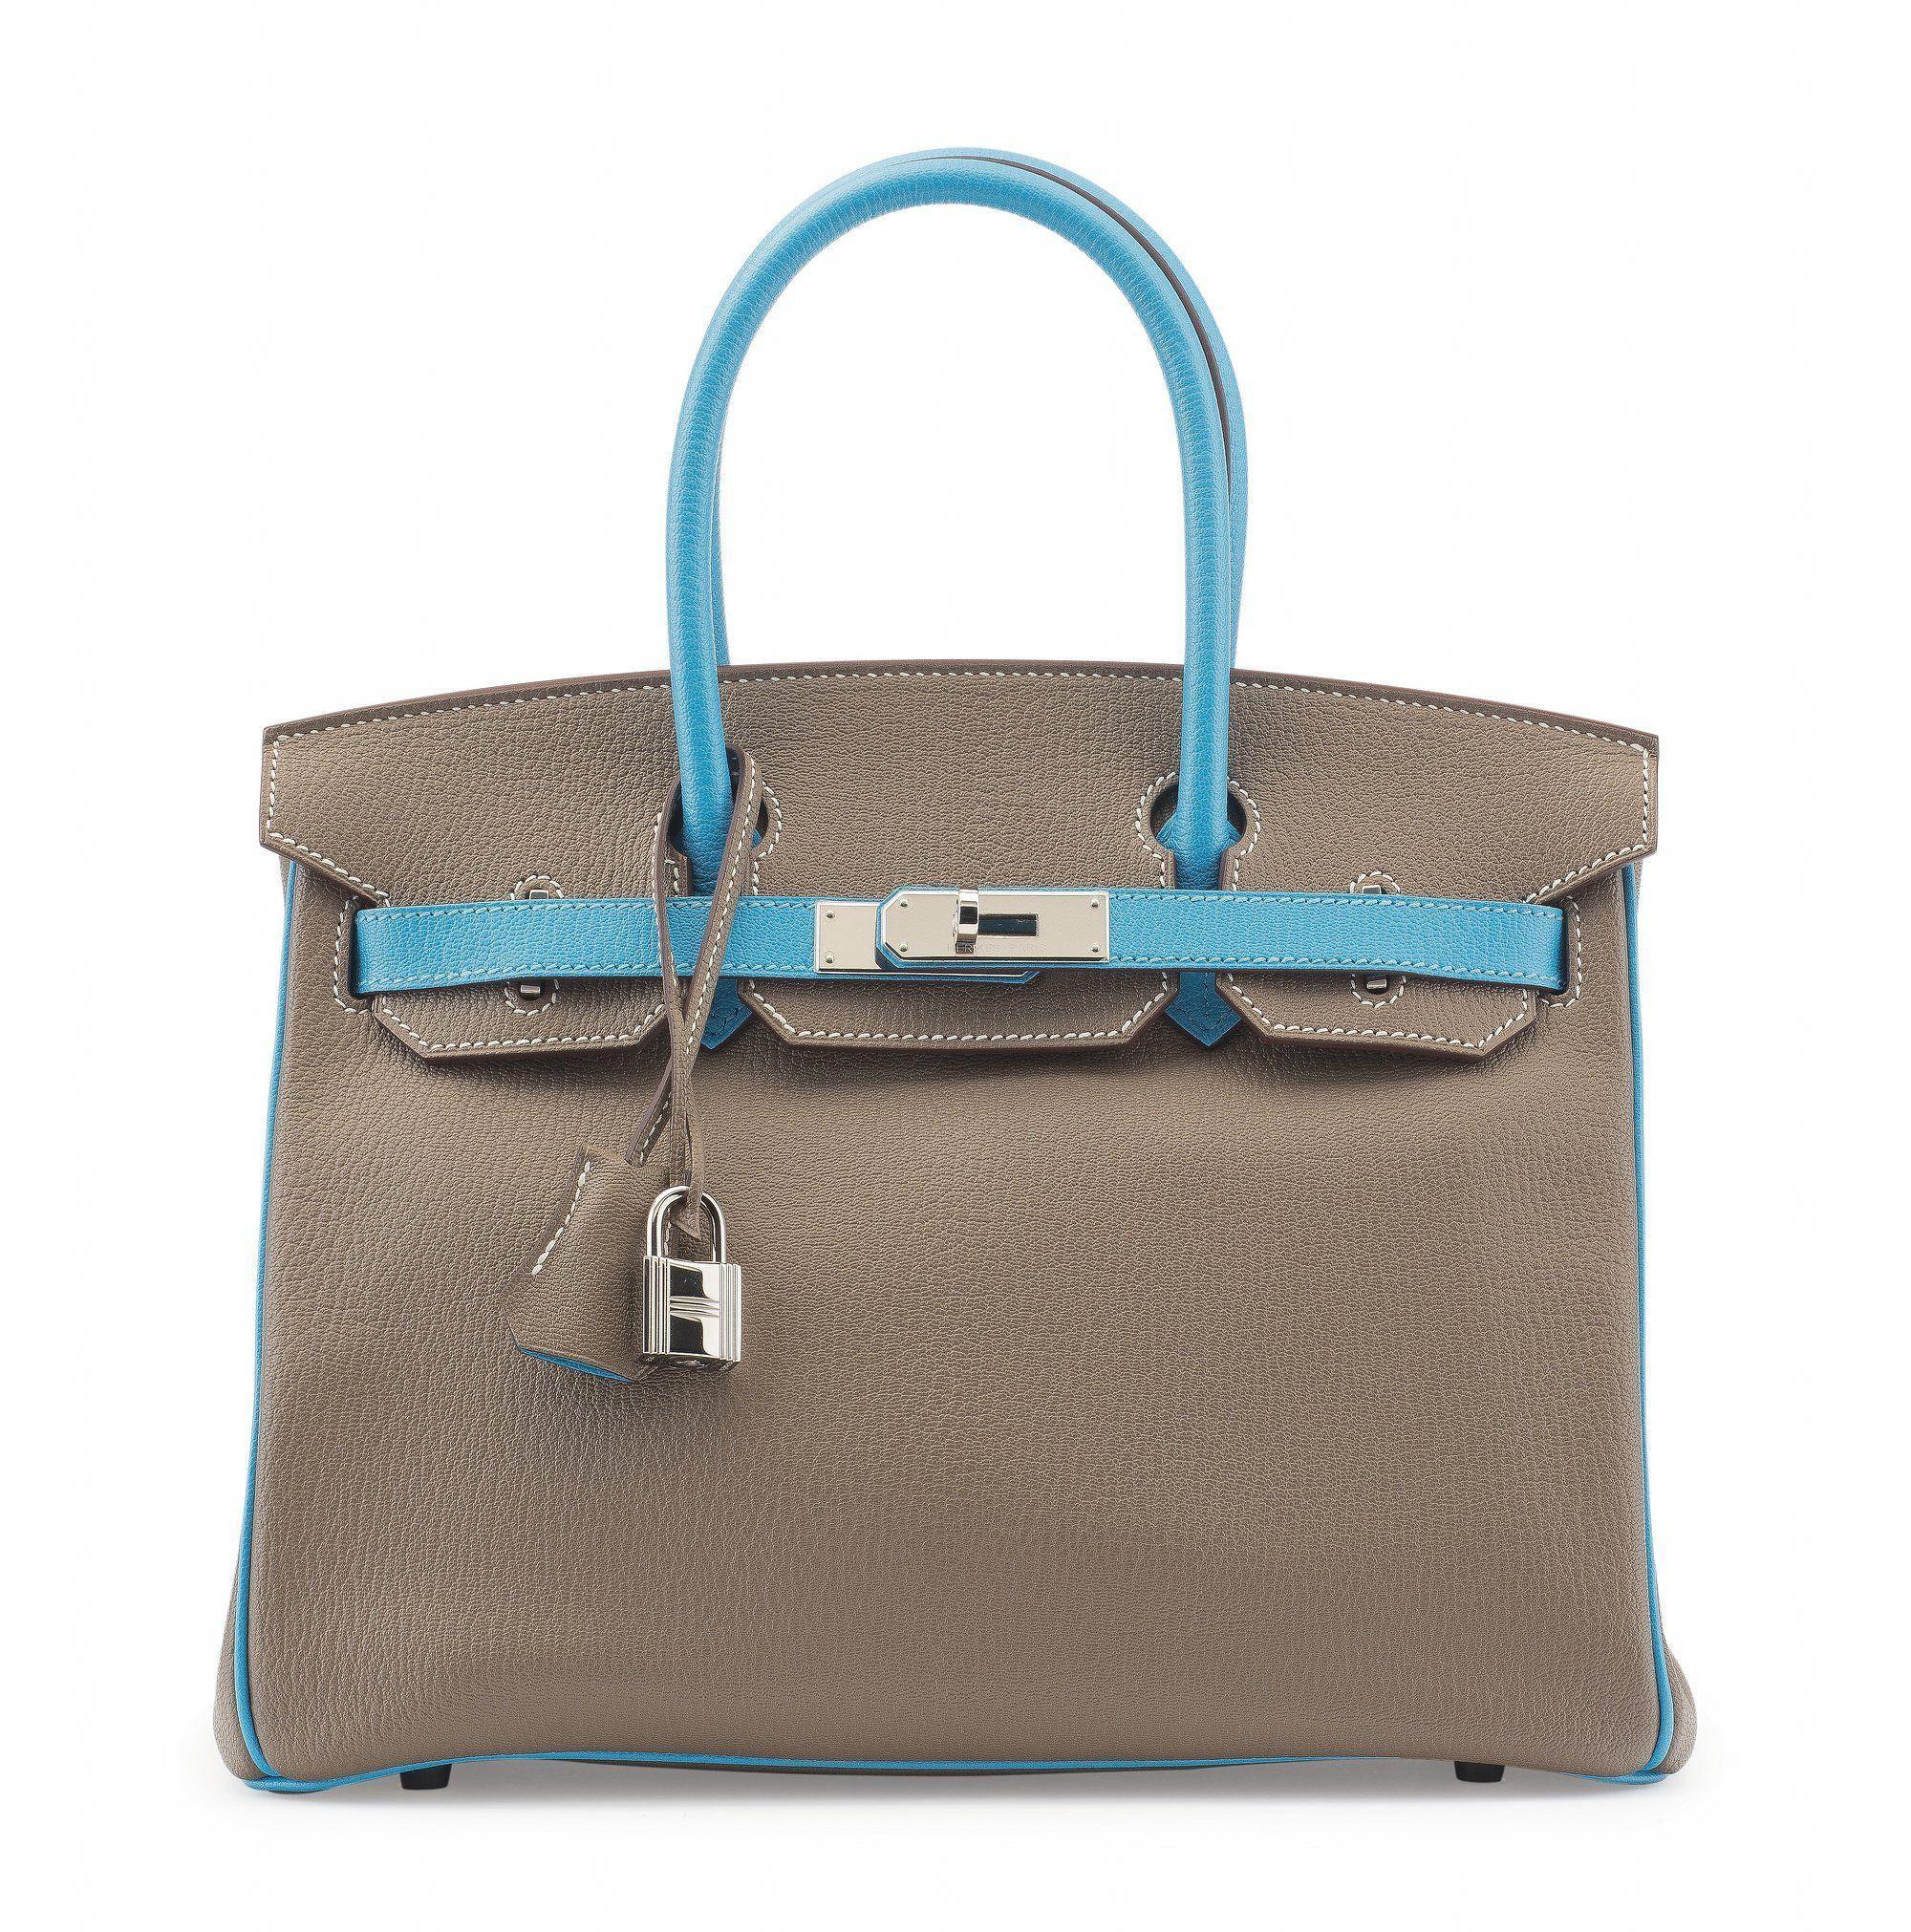 e4893ab1ec1d Hermès special order horseshoe 30cm chèvre leather Birkin bag with  palladium hardware